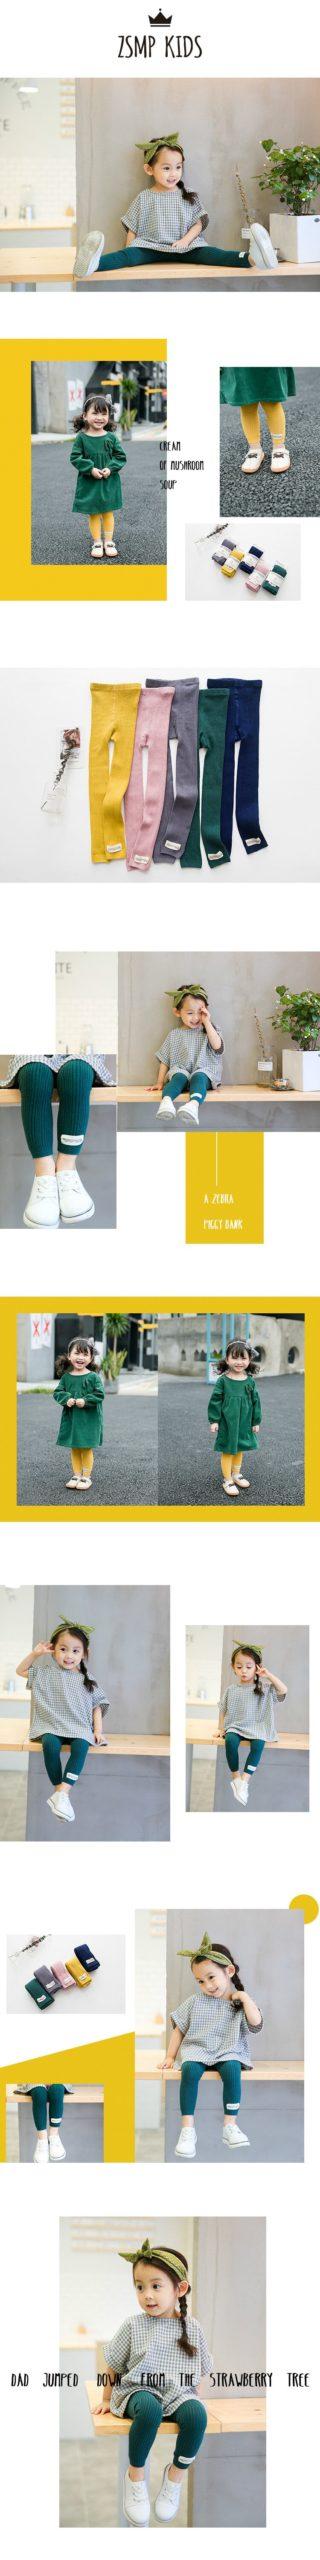 2017 Baby Girls Kids Leggings Autumn Winter Cute Warm Girls' Trousers Children's Clothing Pants